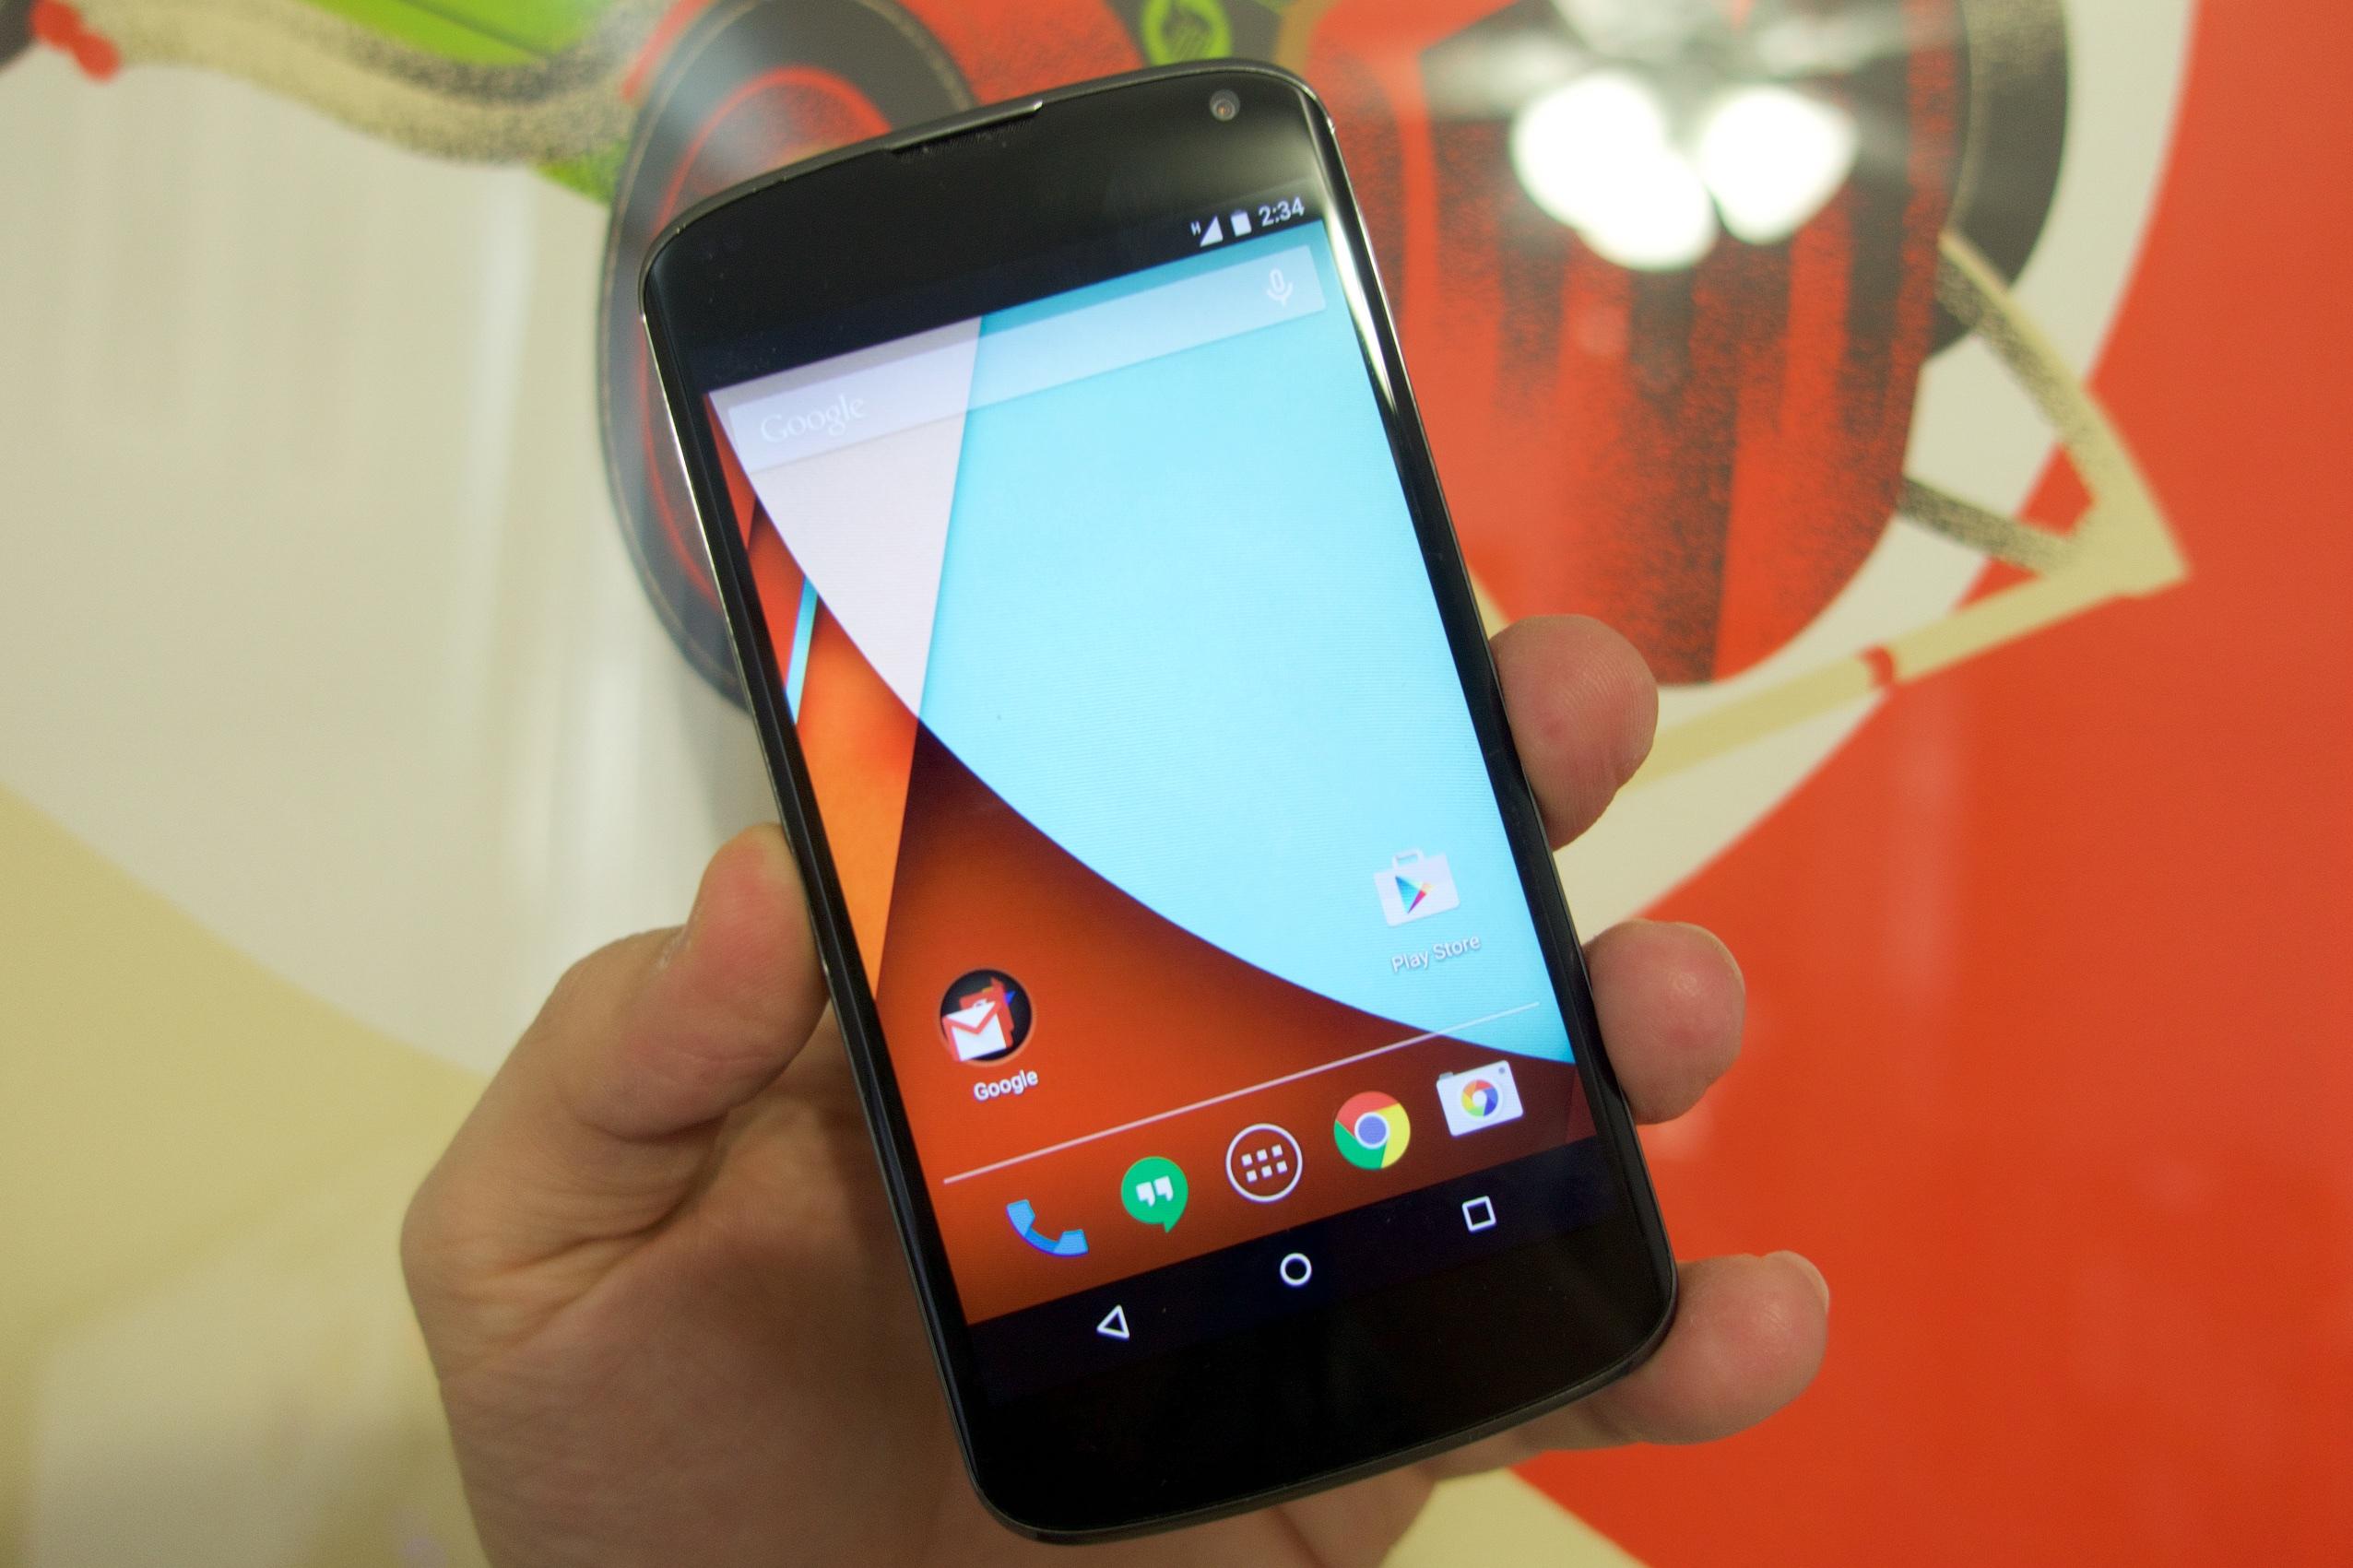 Nexus 4 Android 5.0.1 Uppdateringsrecension tidigt - 4